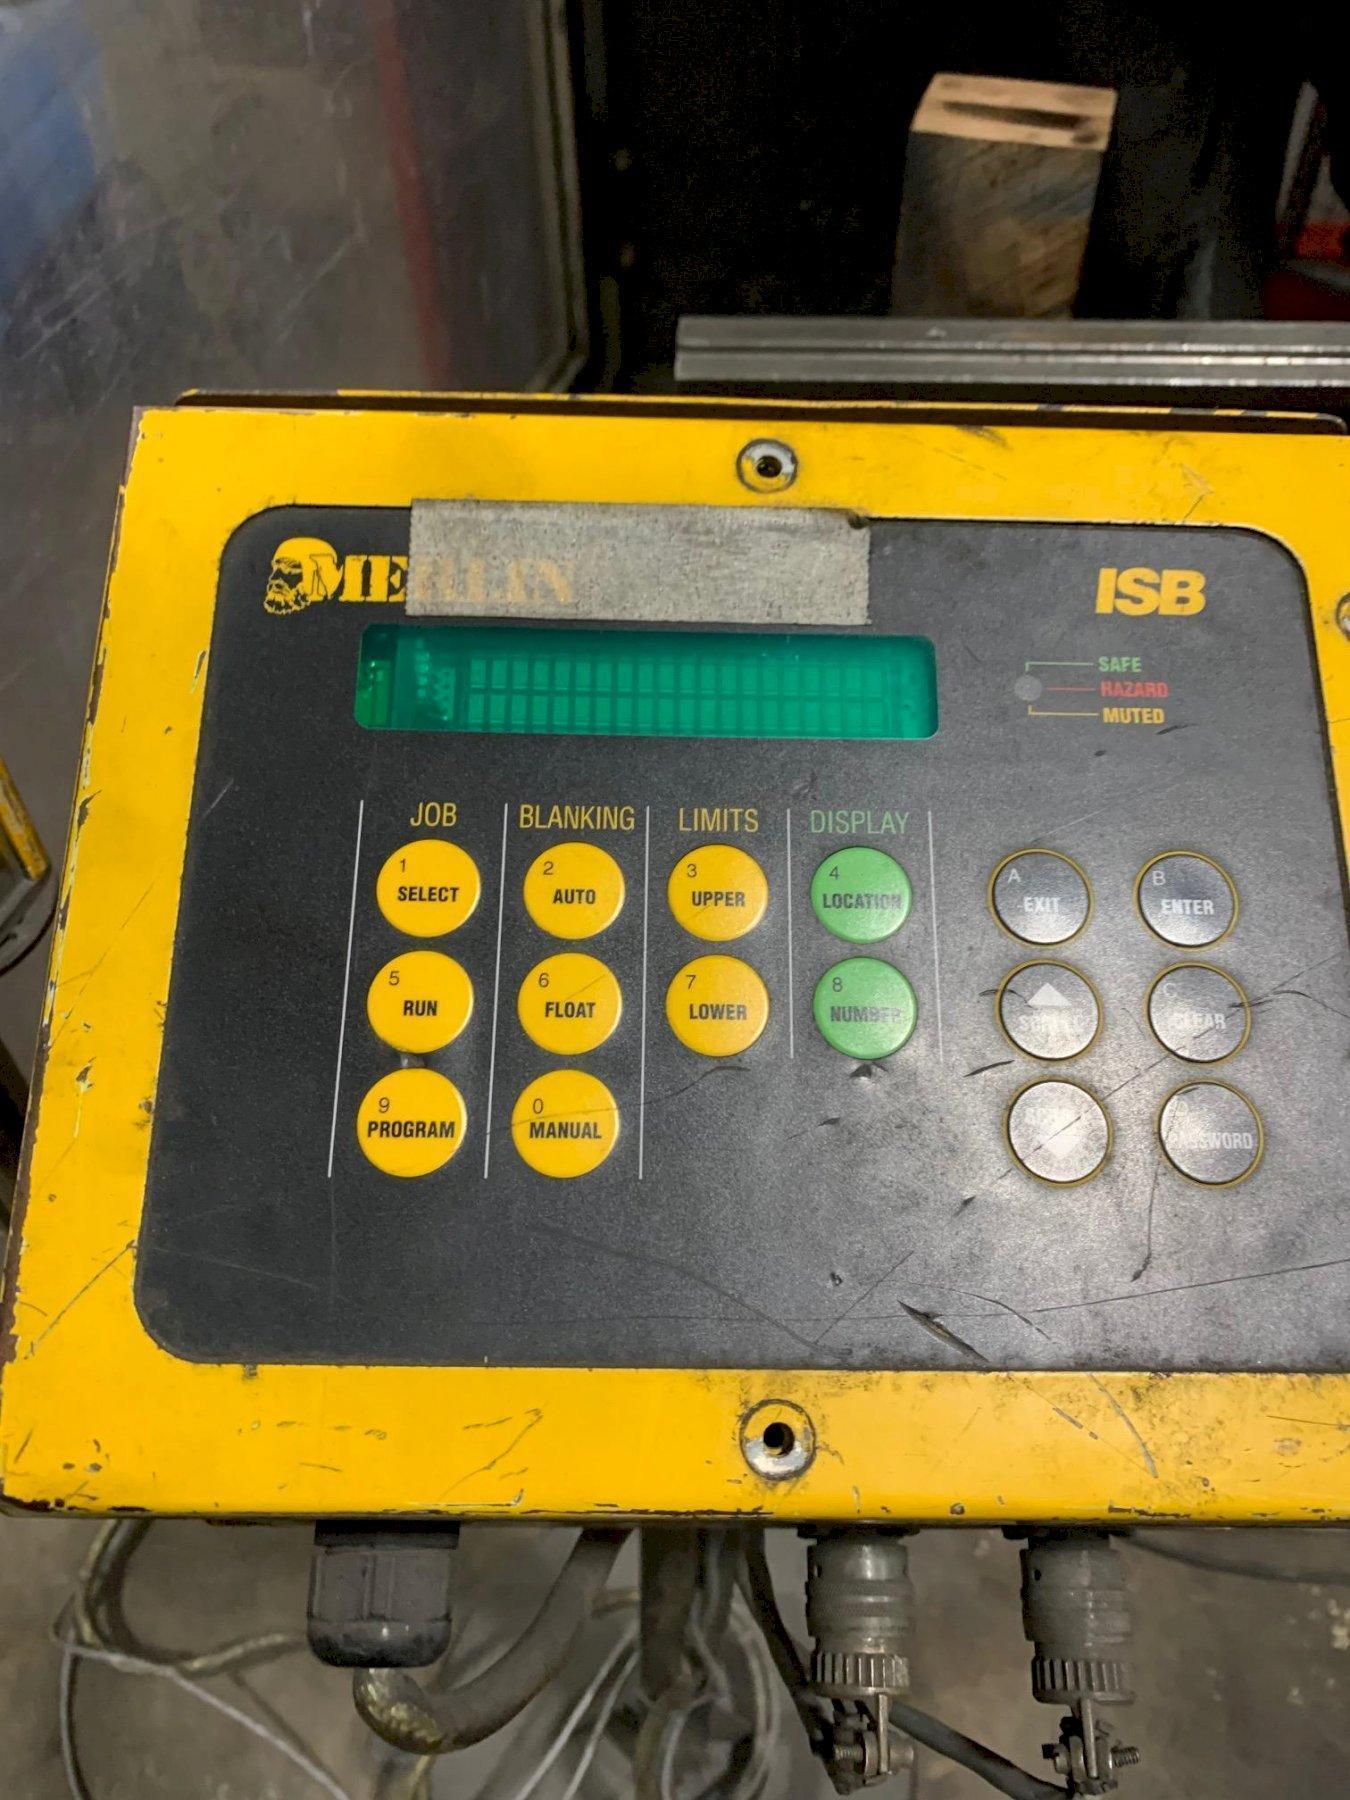 143 TON X 10' MODEL HFE 1303 6-AXIS HYDRAULIC DOWNACTING CNC PRESS BRAKE